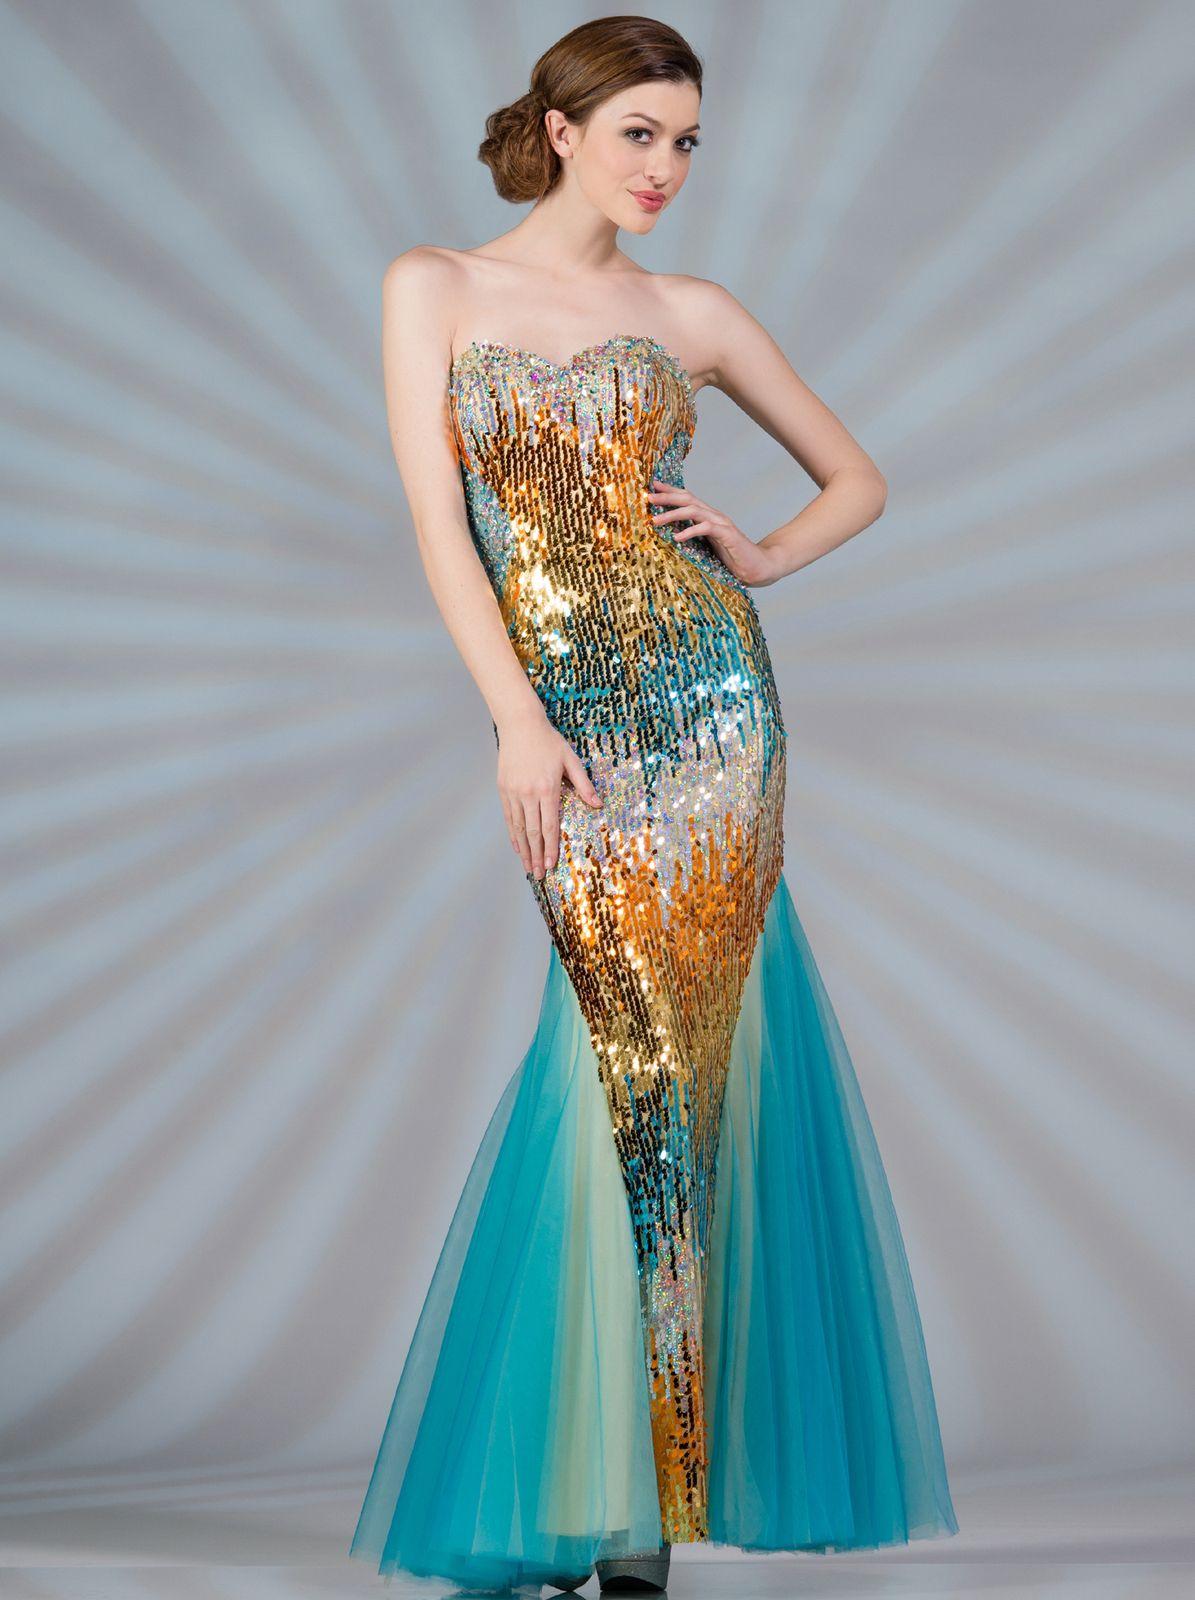 Unusual Champagne Color Prom Dress Ideas - Wedding Ideas - memiocall.com